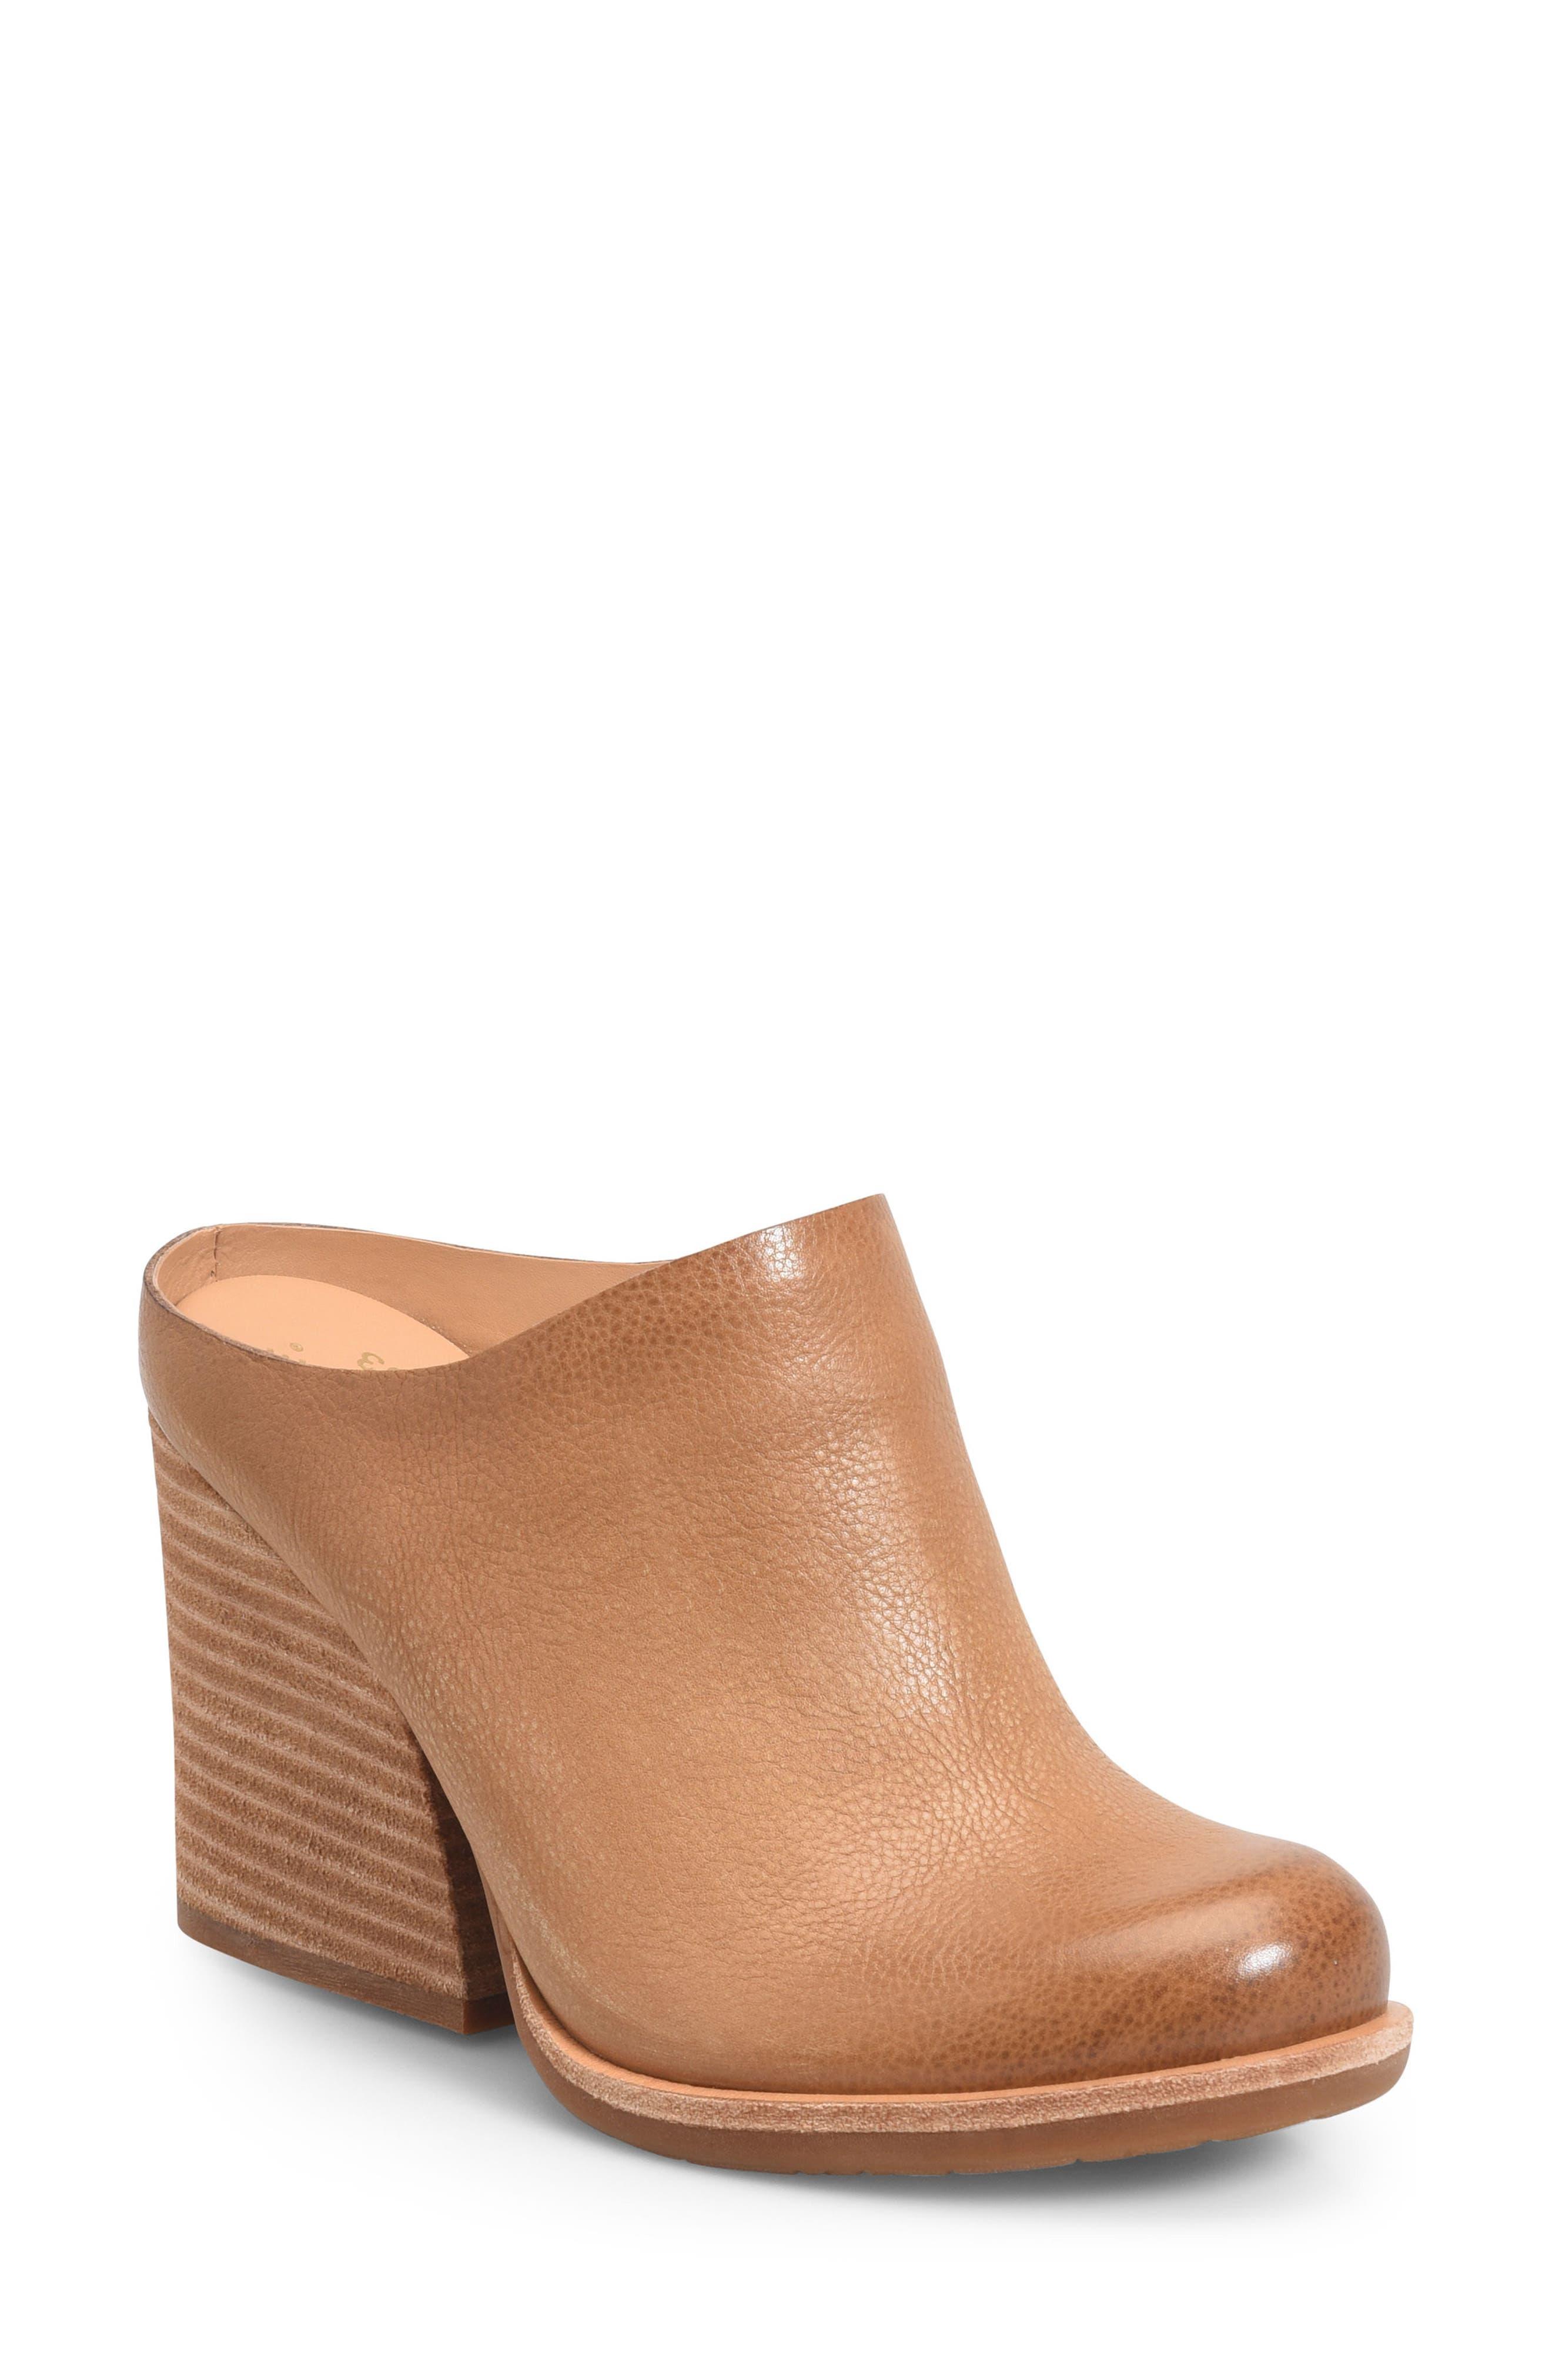 Kork-Ease Challise Clog,                         Main,                         color, Tan Leather